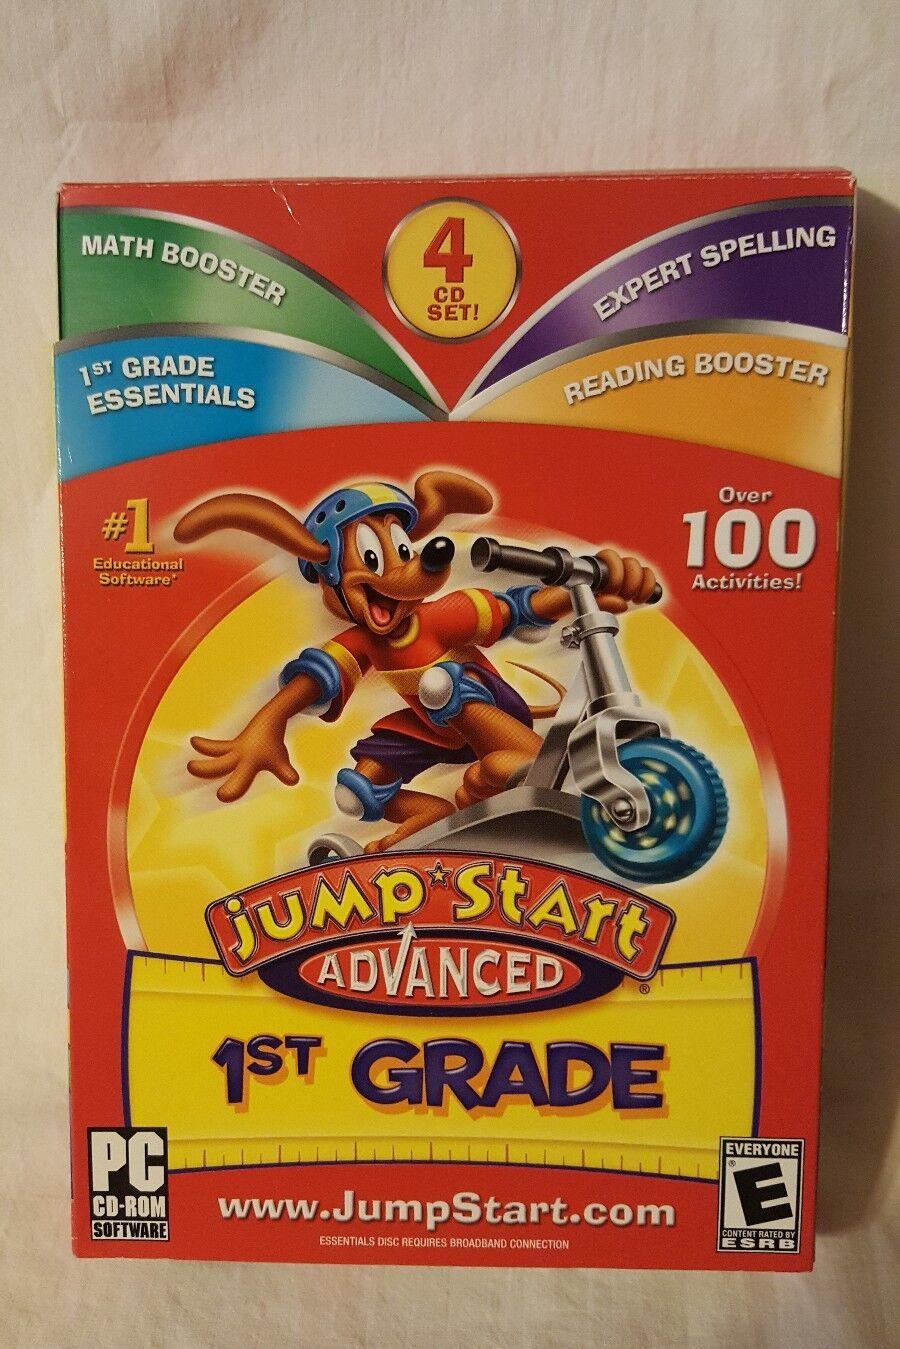 Jump Start Advanced 1st Grade PC CD ROM 4 Disc Set #1 Educational